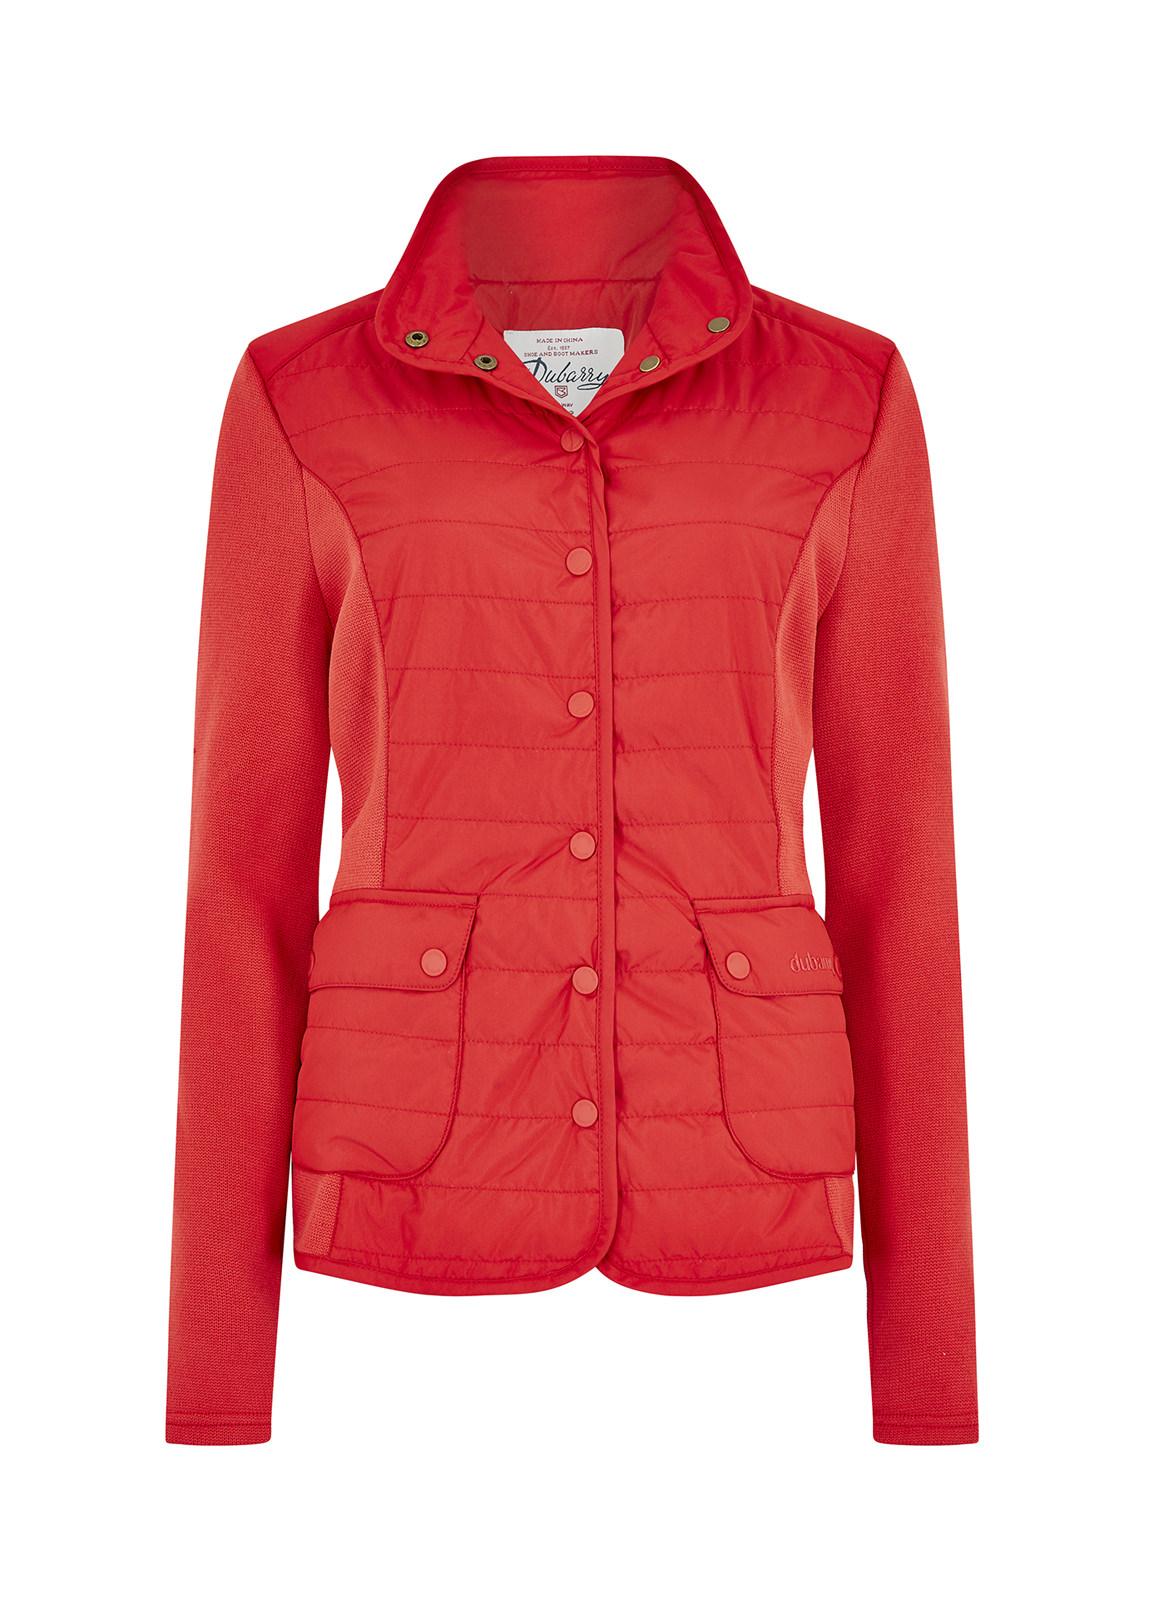 Dubarry_ Terryglass jacket - Poppy_Image_2